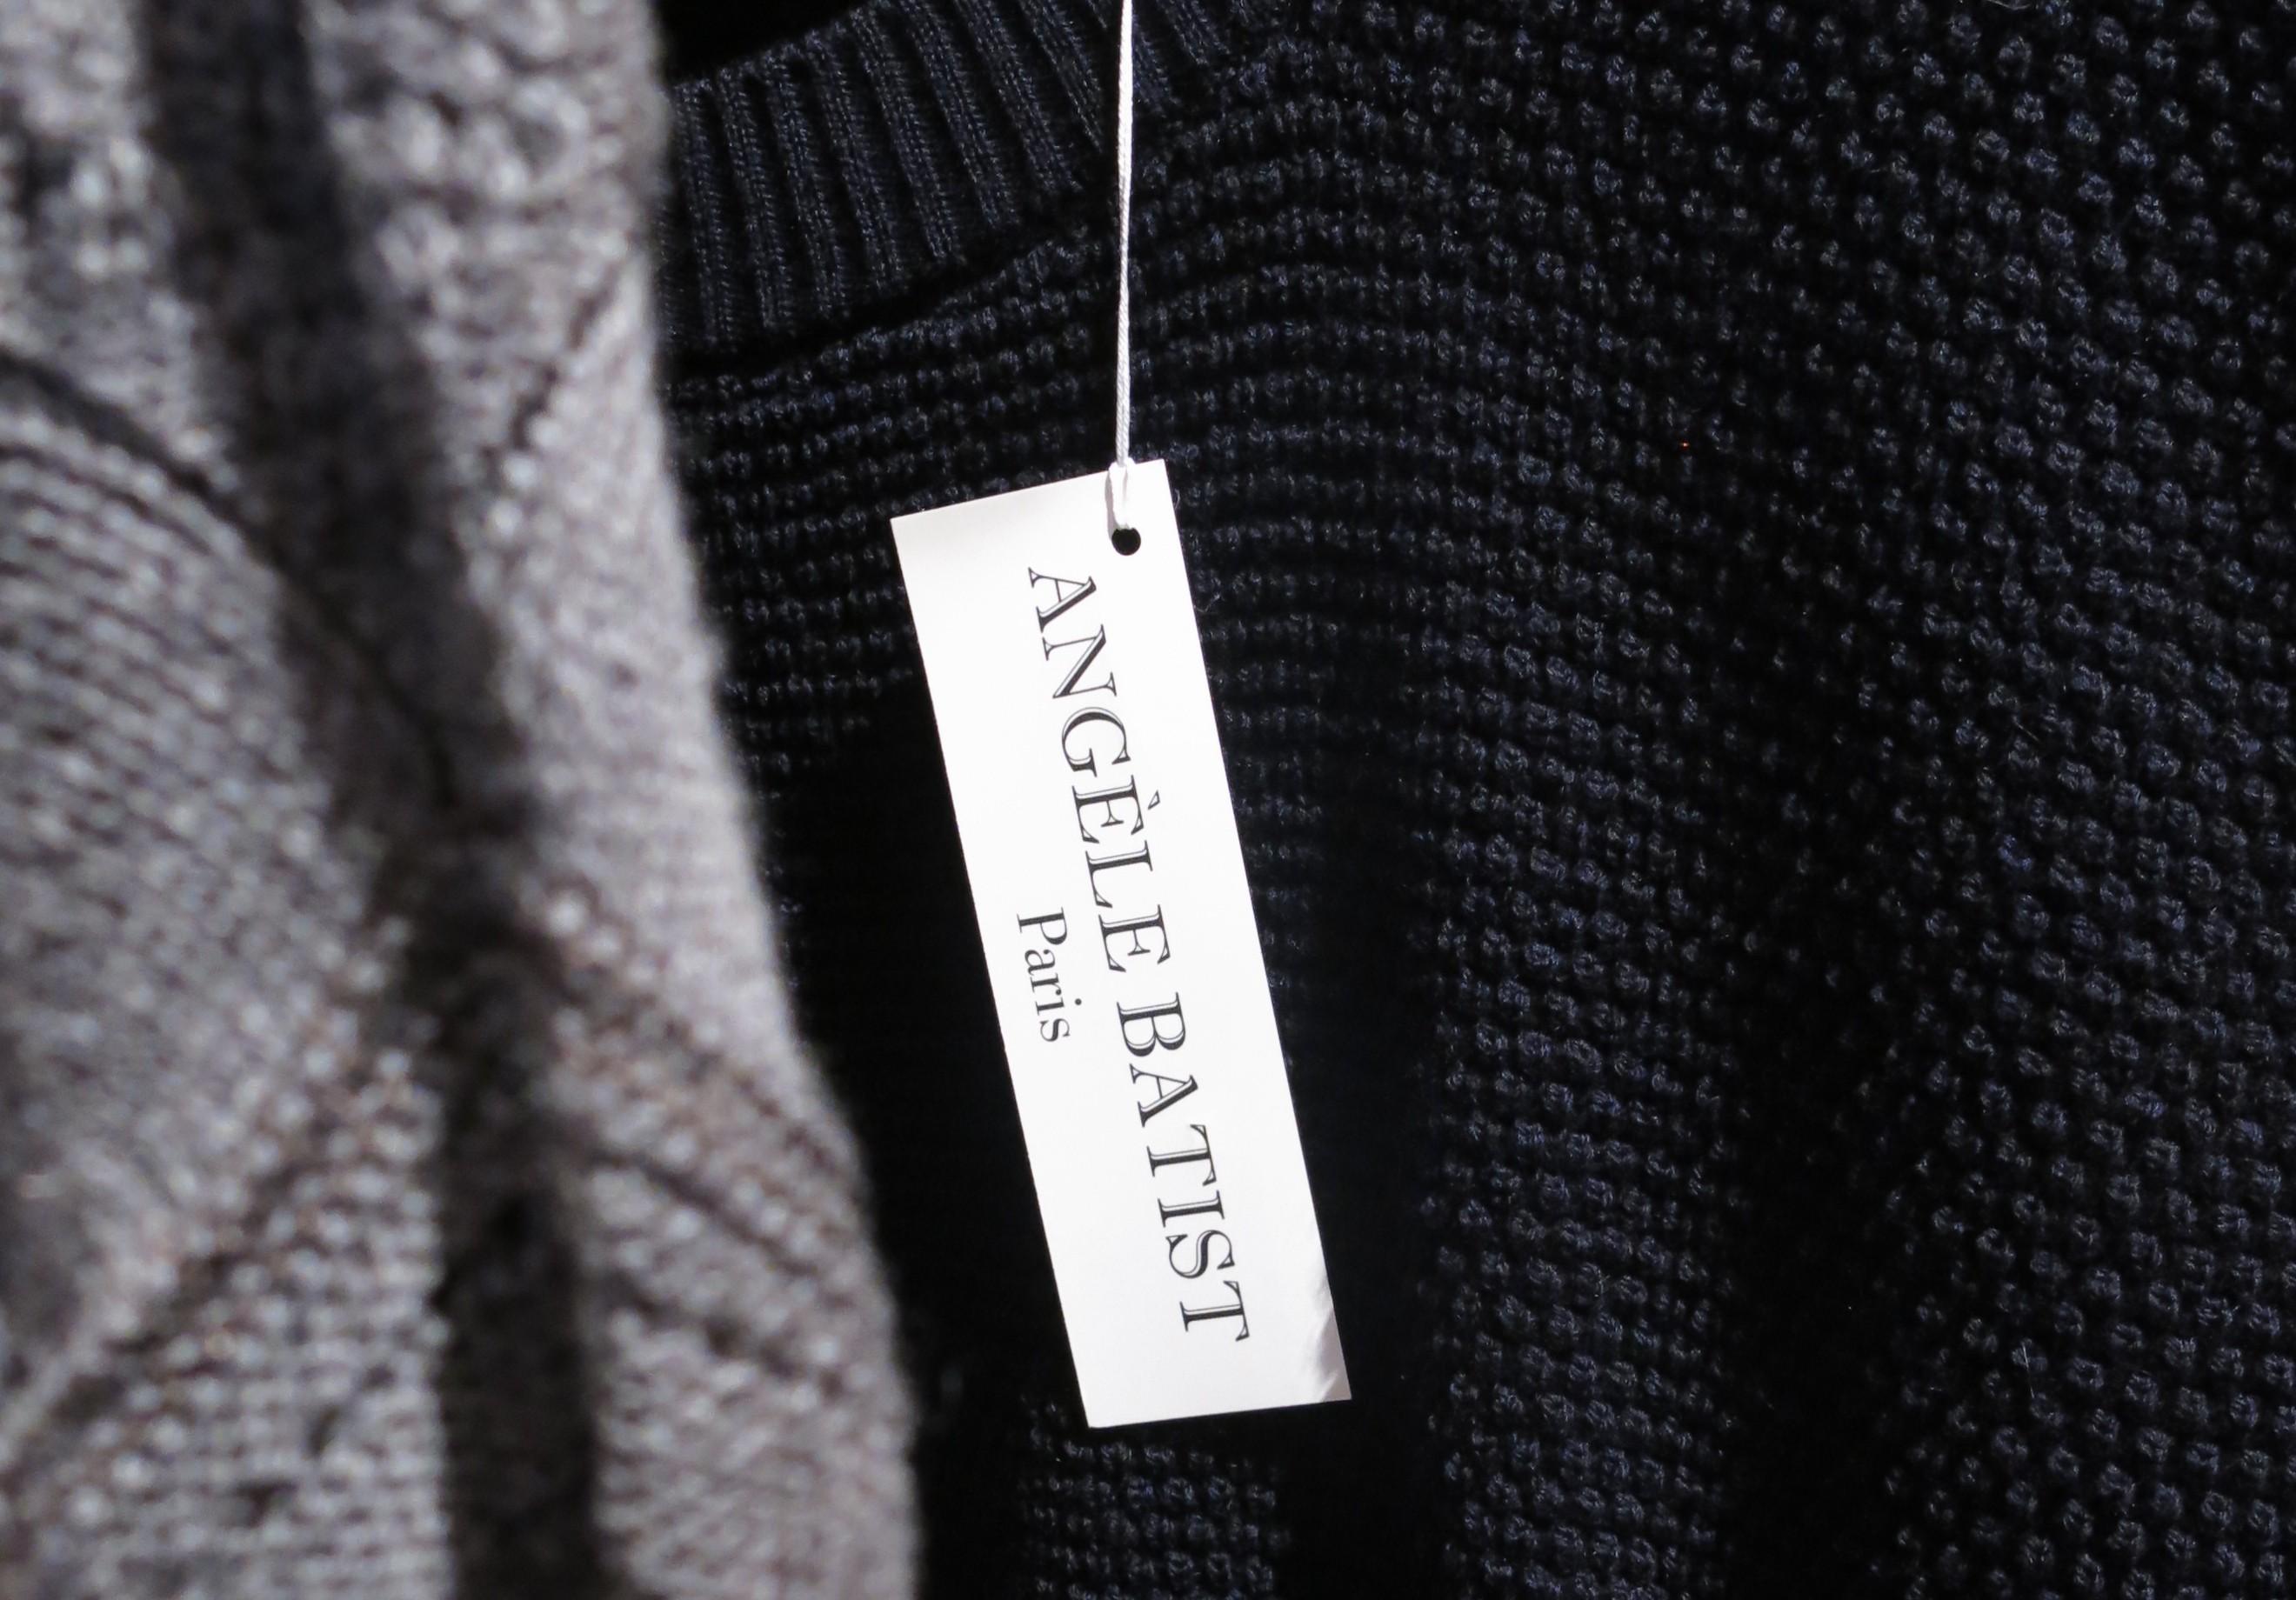 world tricot lure a la conqu te de l 39 est. Black Bedroom Furniture Sets. Home Design Ideas